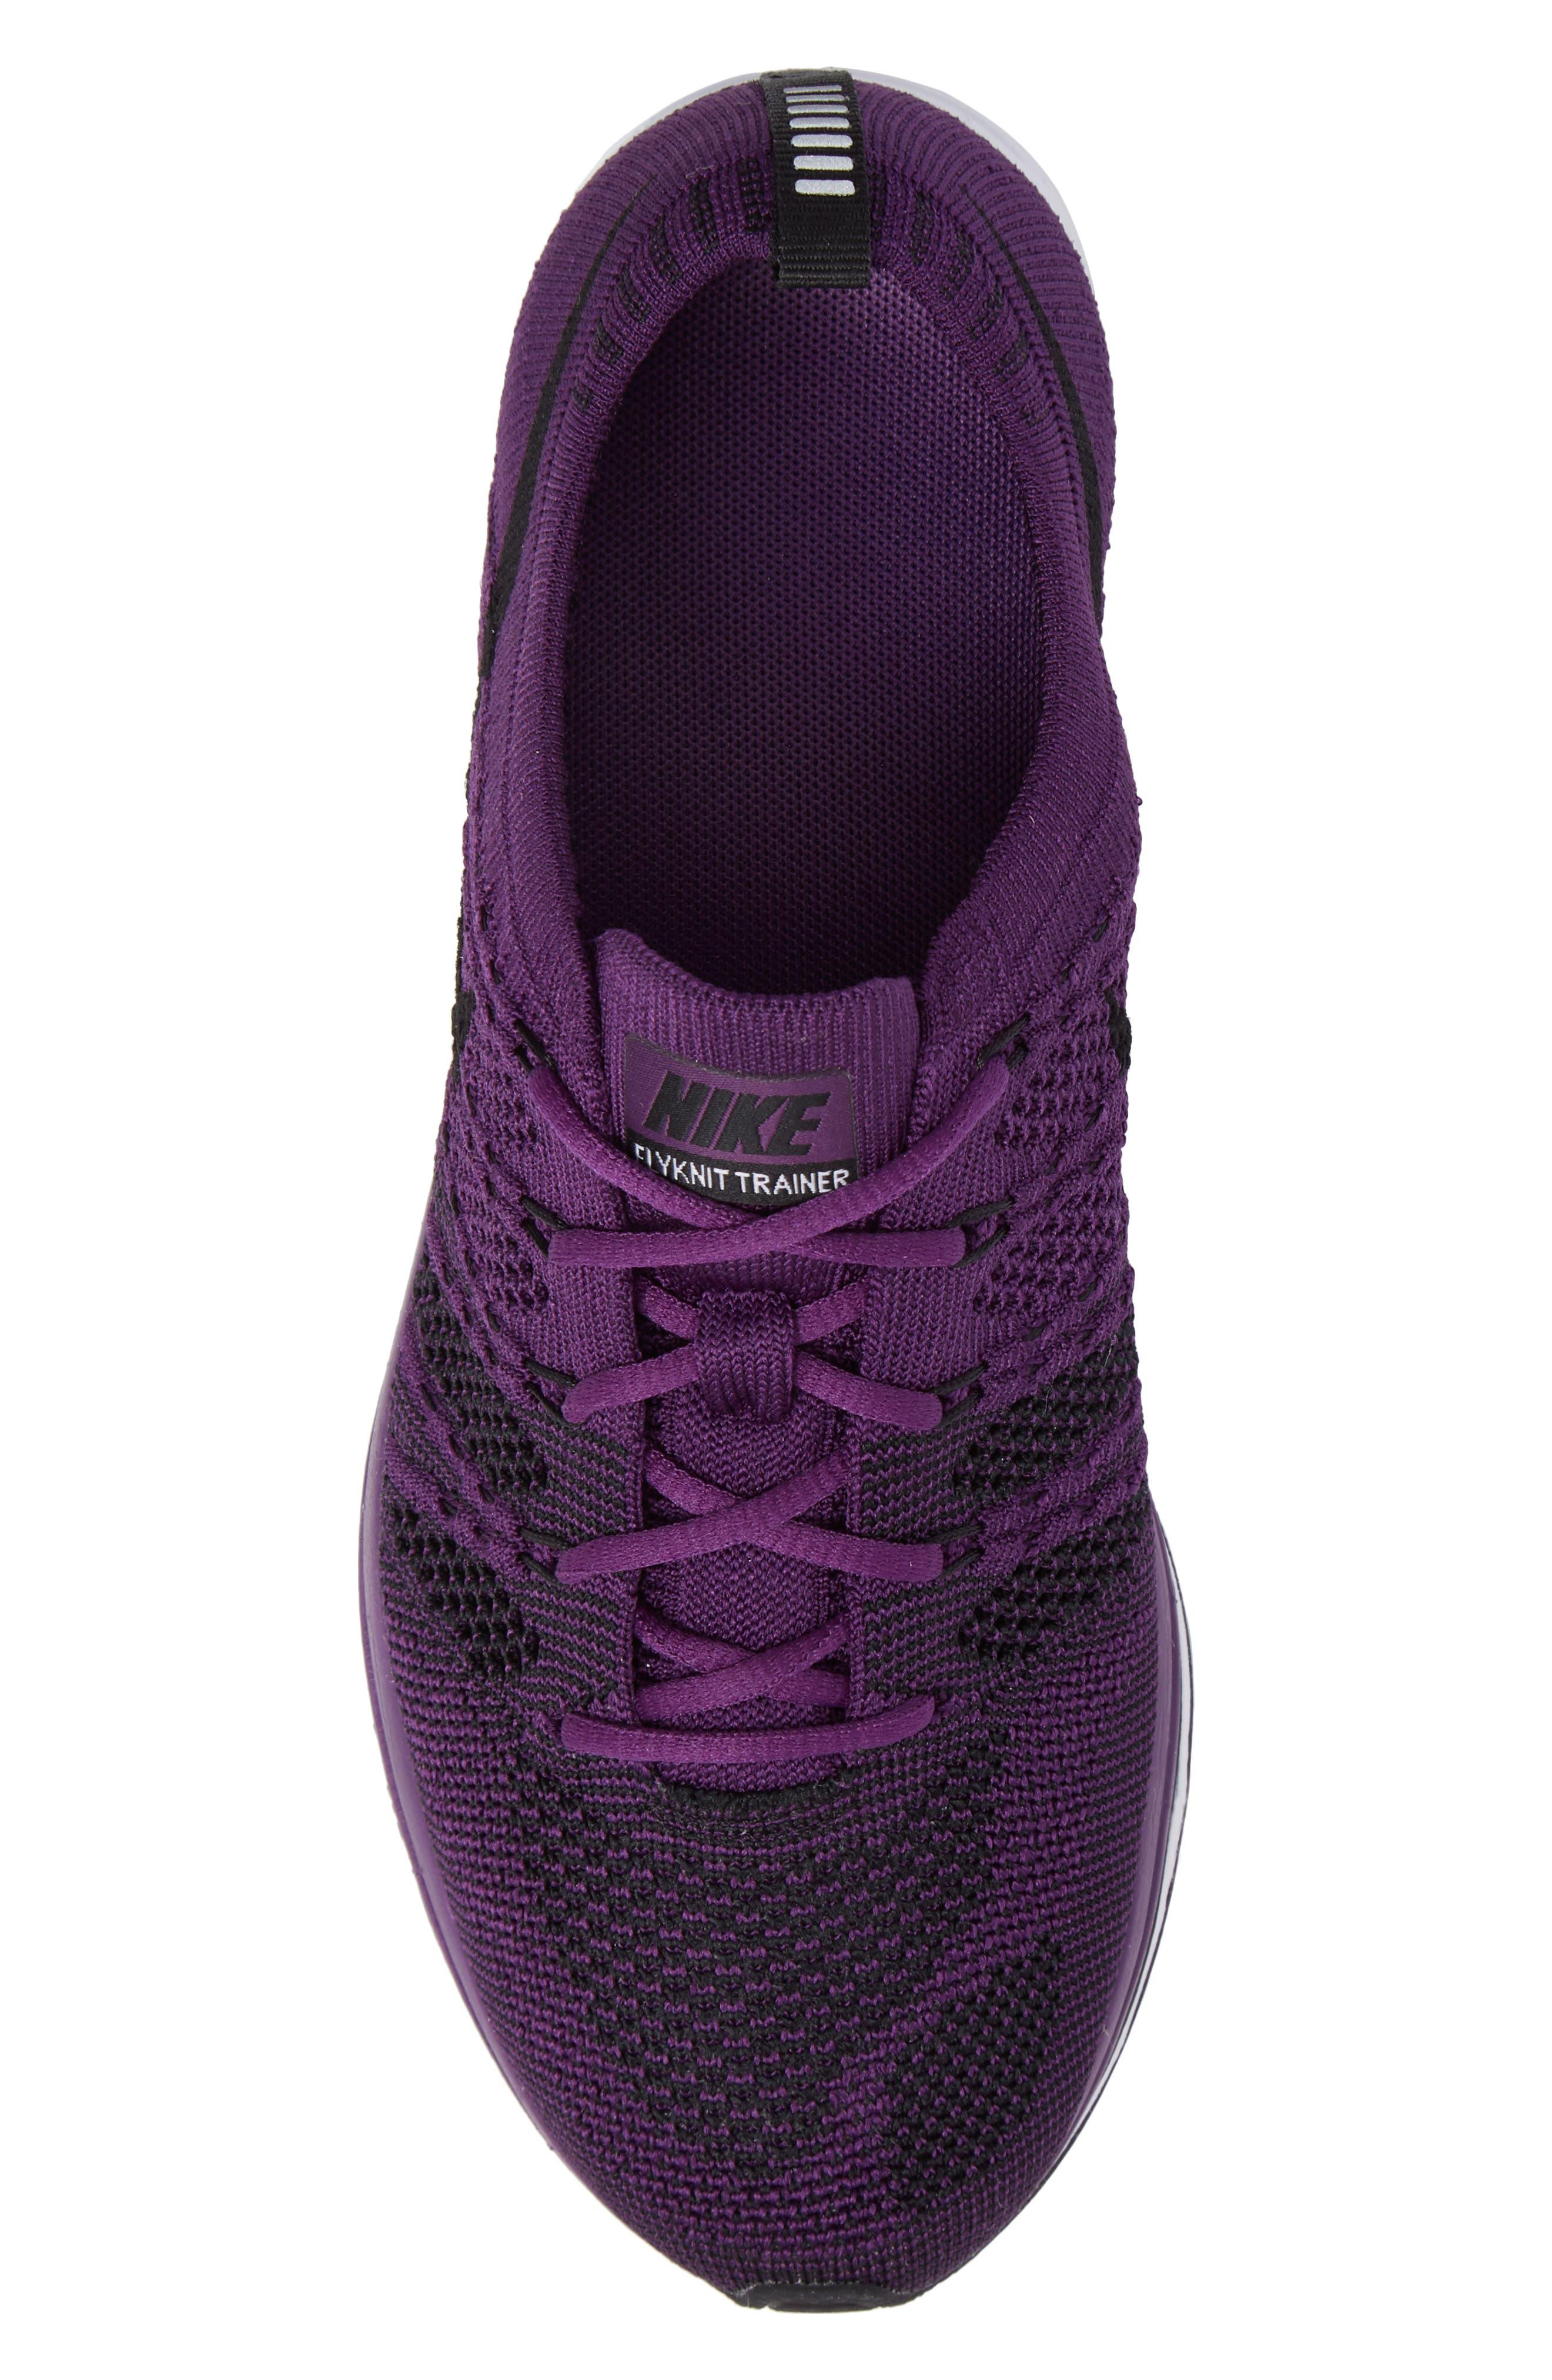 NikeLab Flyknit Trainer Sneaker,                             Alternate thumbnail 5, color,                             NIGHT PURPLE/ BLACK/ WHITE